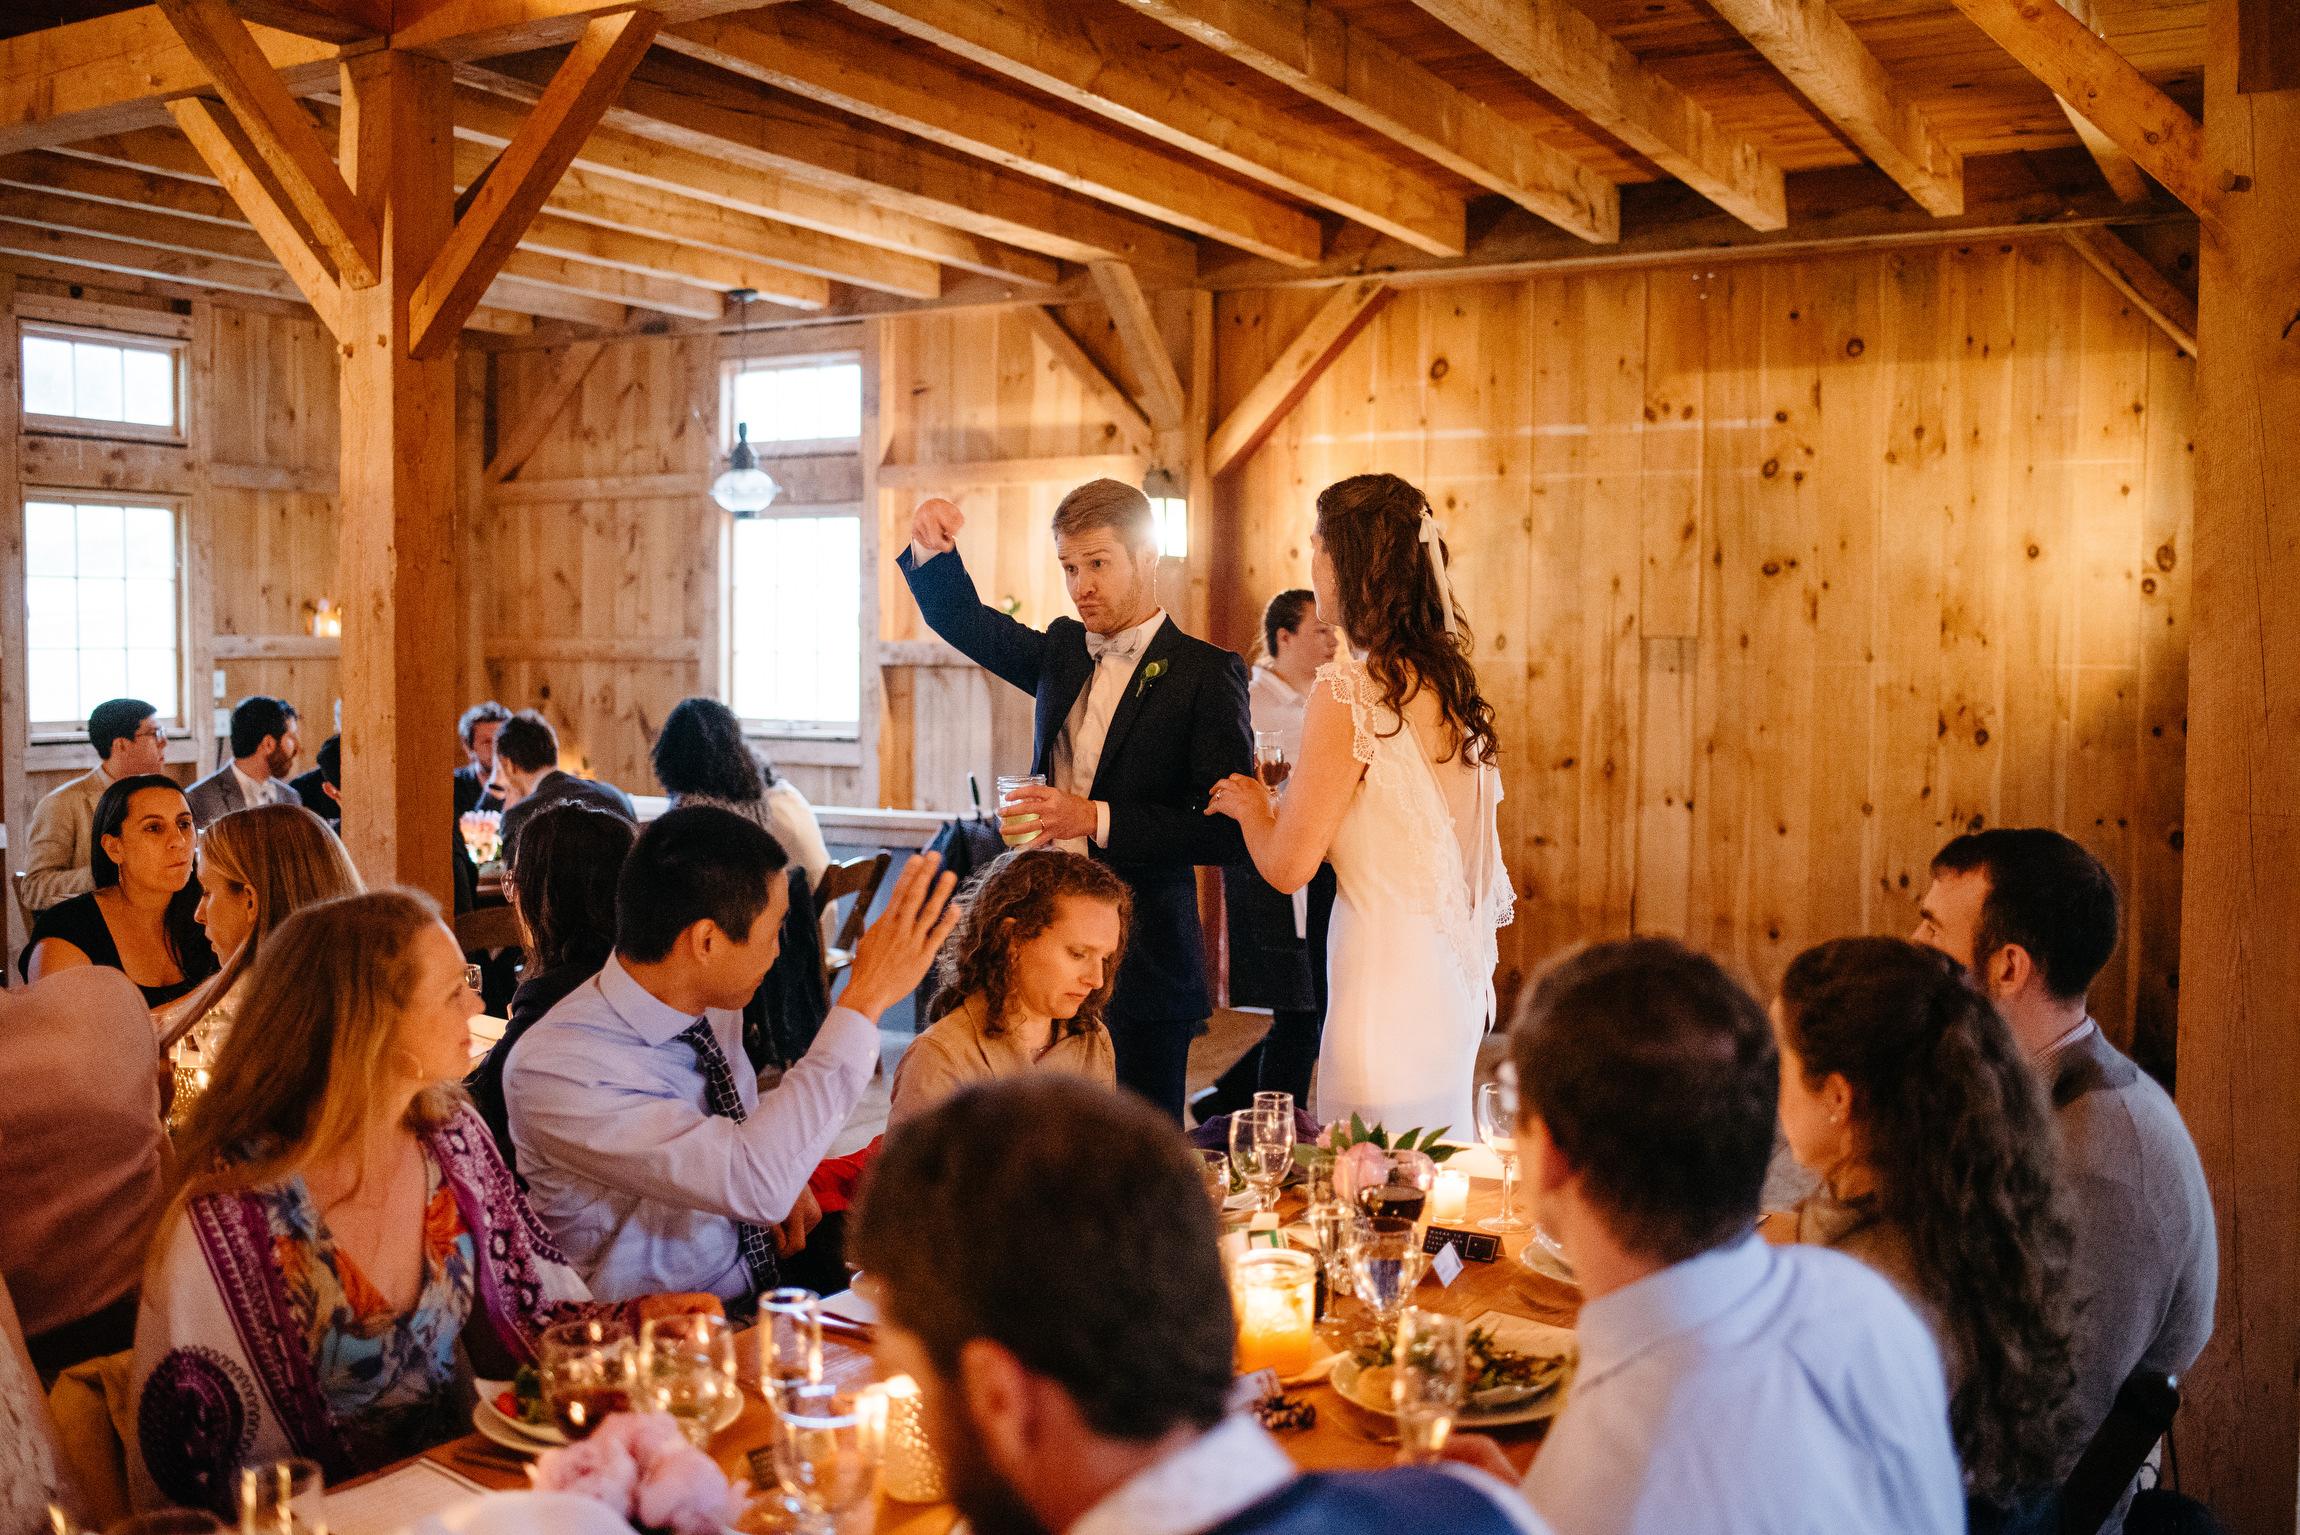 vermont_farm_wedding_photos_mikhail_glabetS_56.JPG